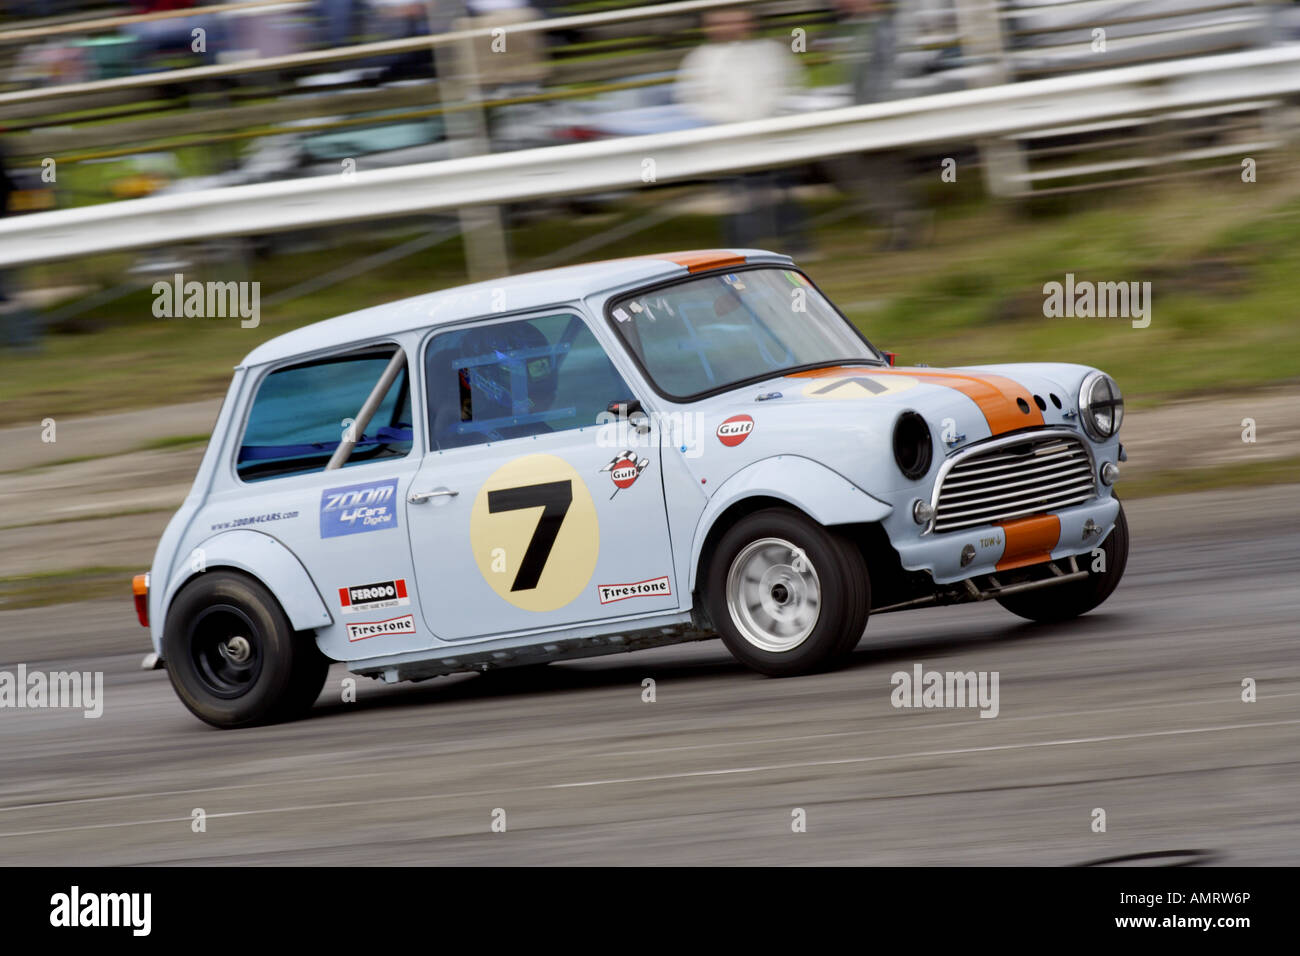 Mini Drag Racing at York Stock Photo: 15327837 - Alamy